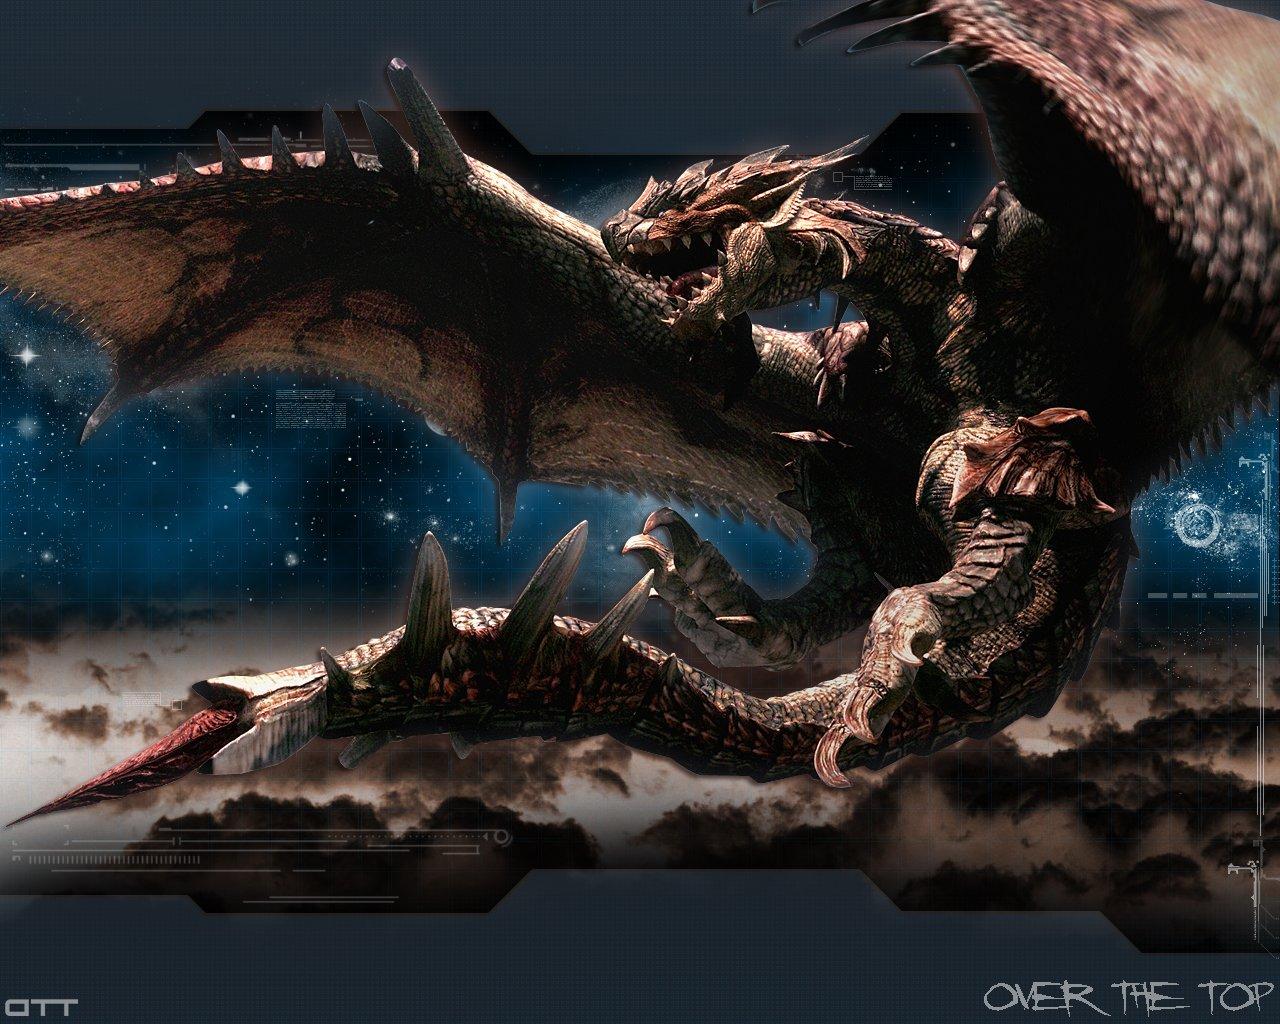 dragon Computer Wallpapers Desktop Backgrounds 1280x1024 ID 1280x1024